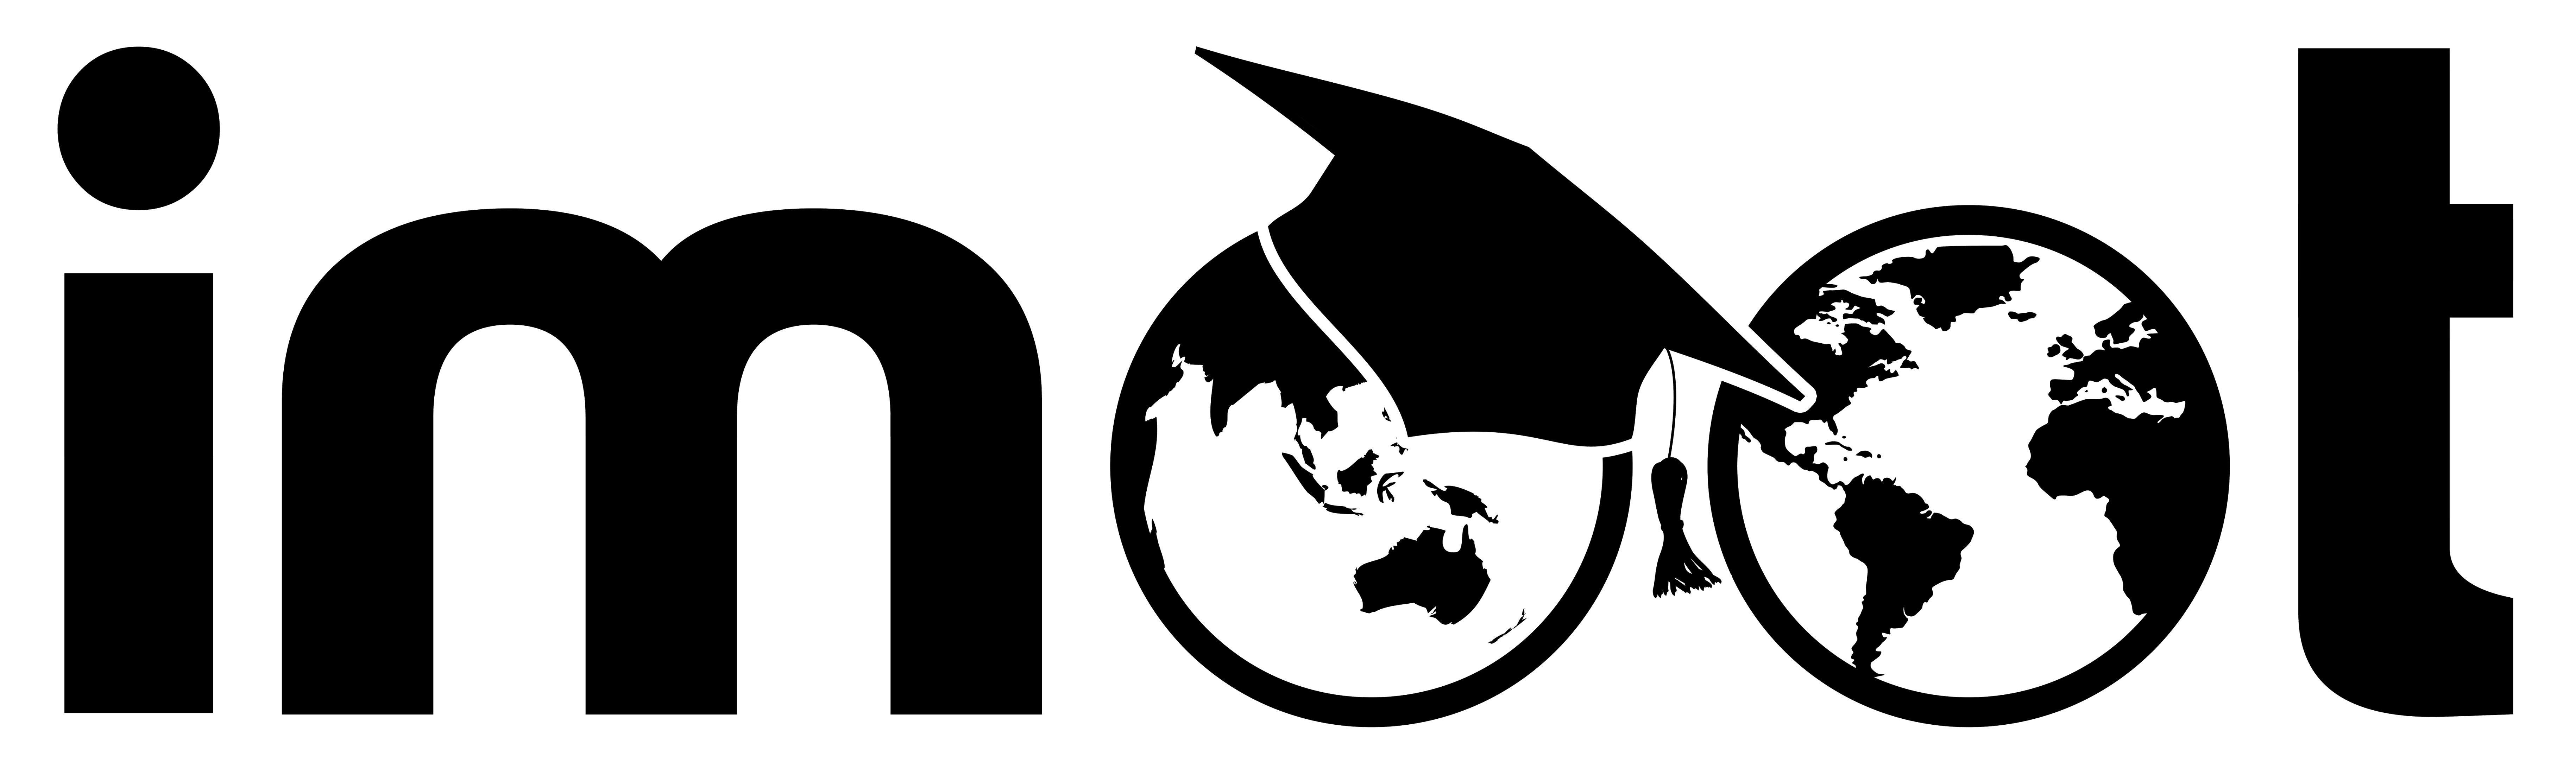 iMoot logo